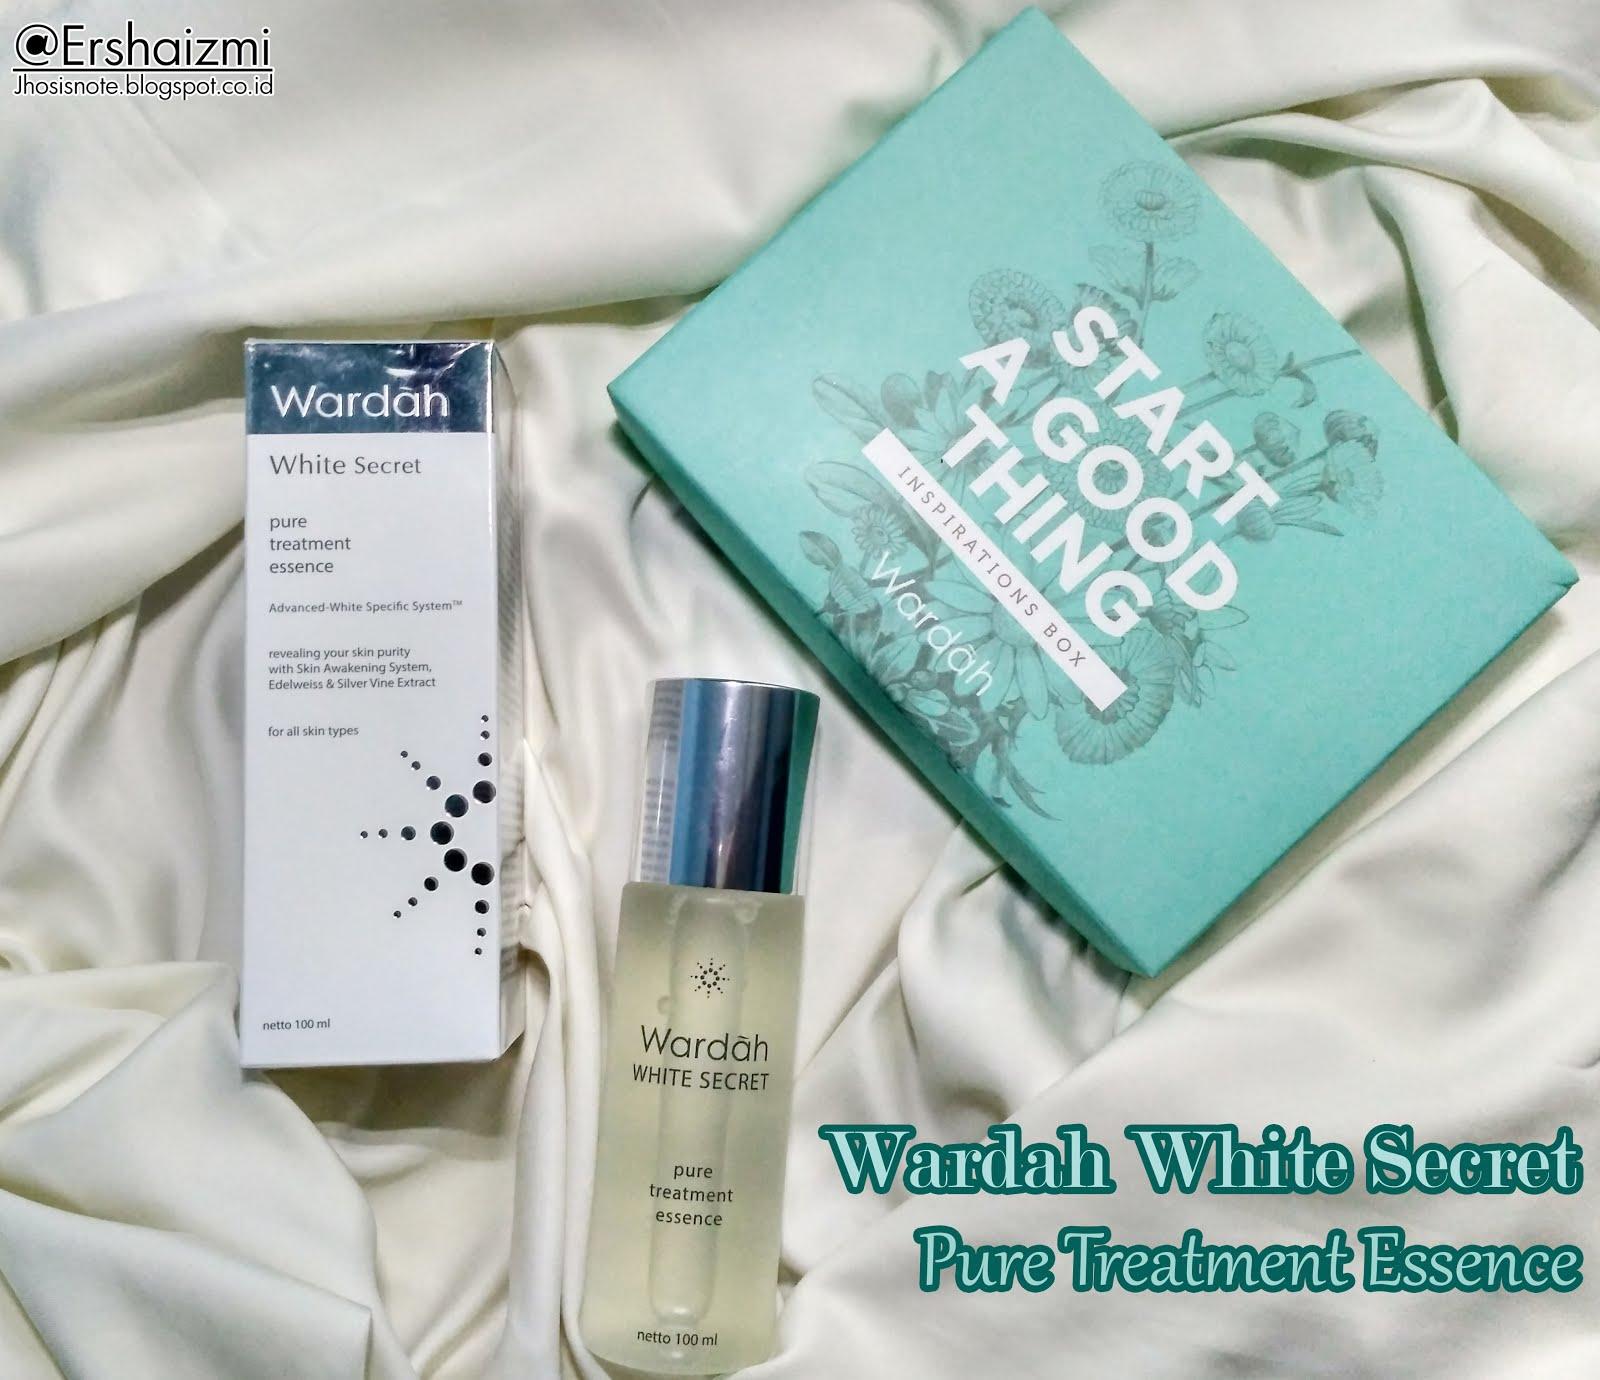 Wardah White Secret Pure Treatment Essence Review Daftar Harga Pte